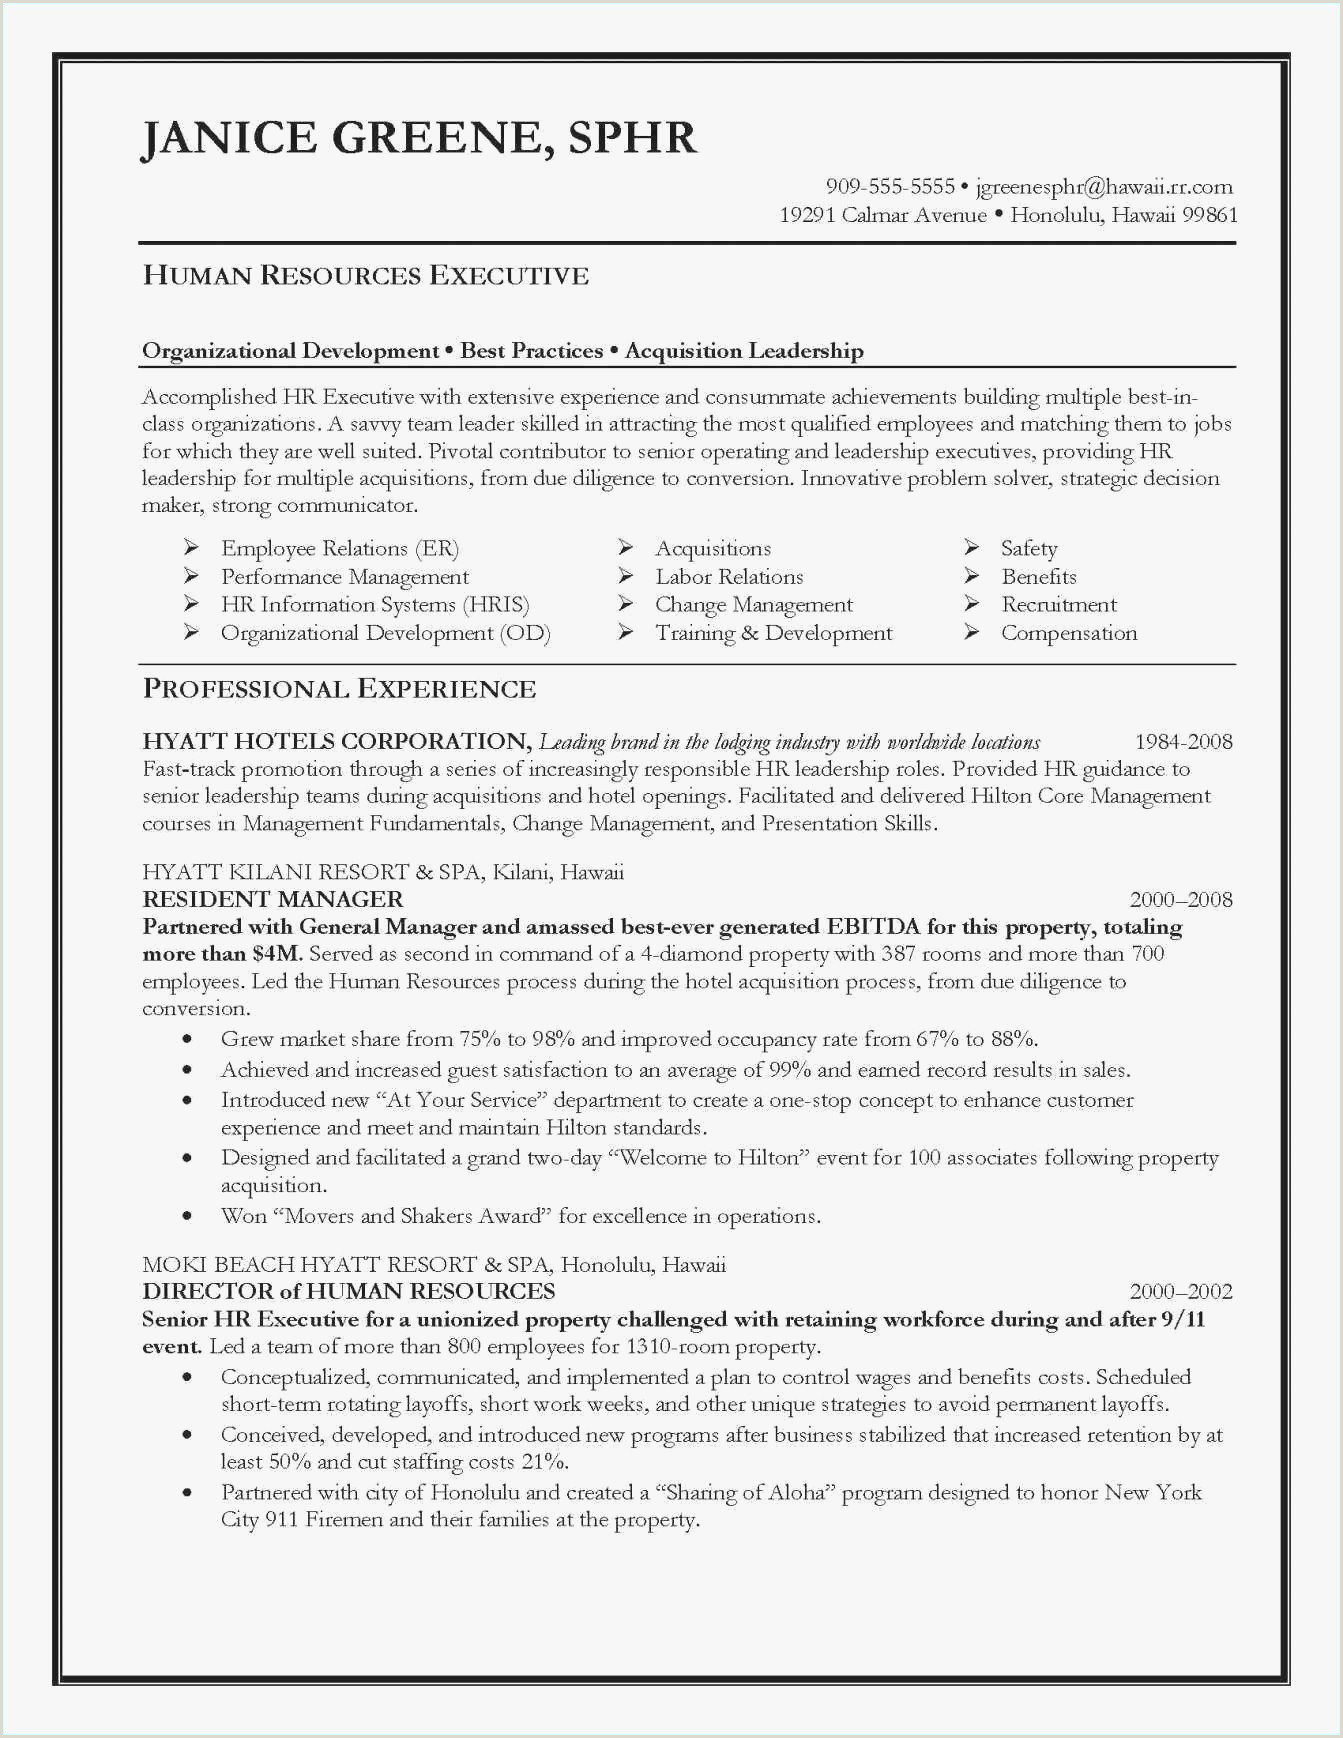 Construction Management Resume Objective Program Manager Resume Examples Luxury Awesome Construction